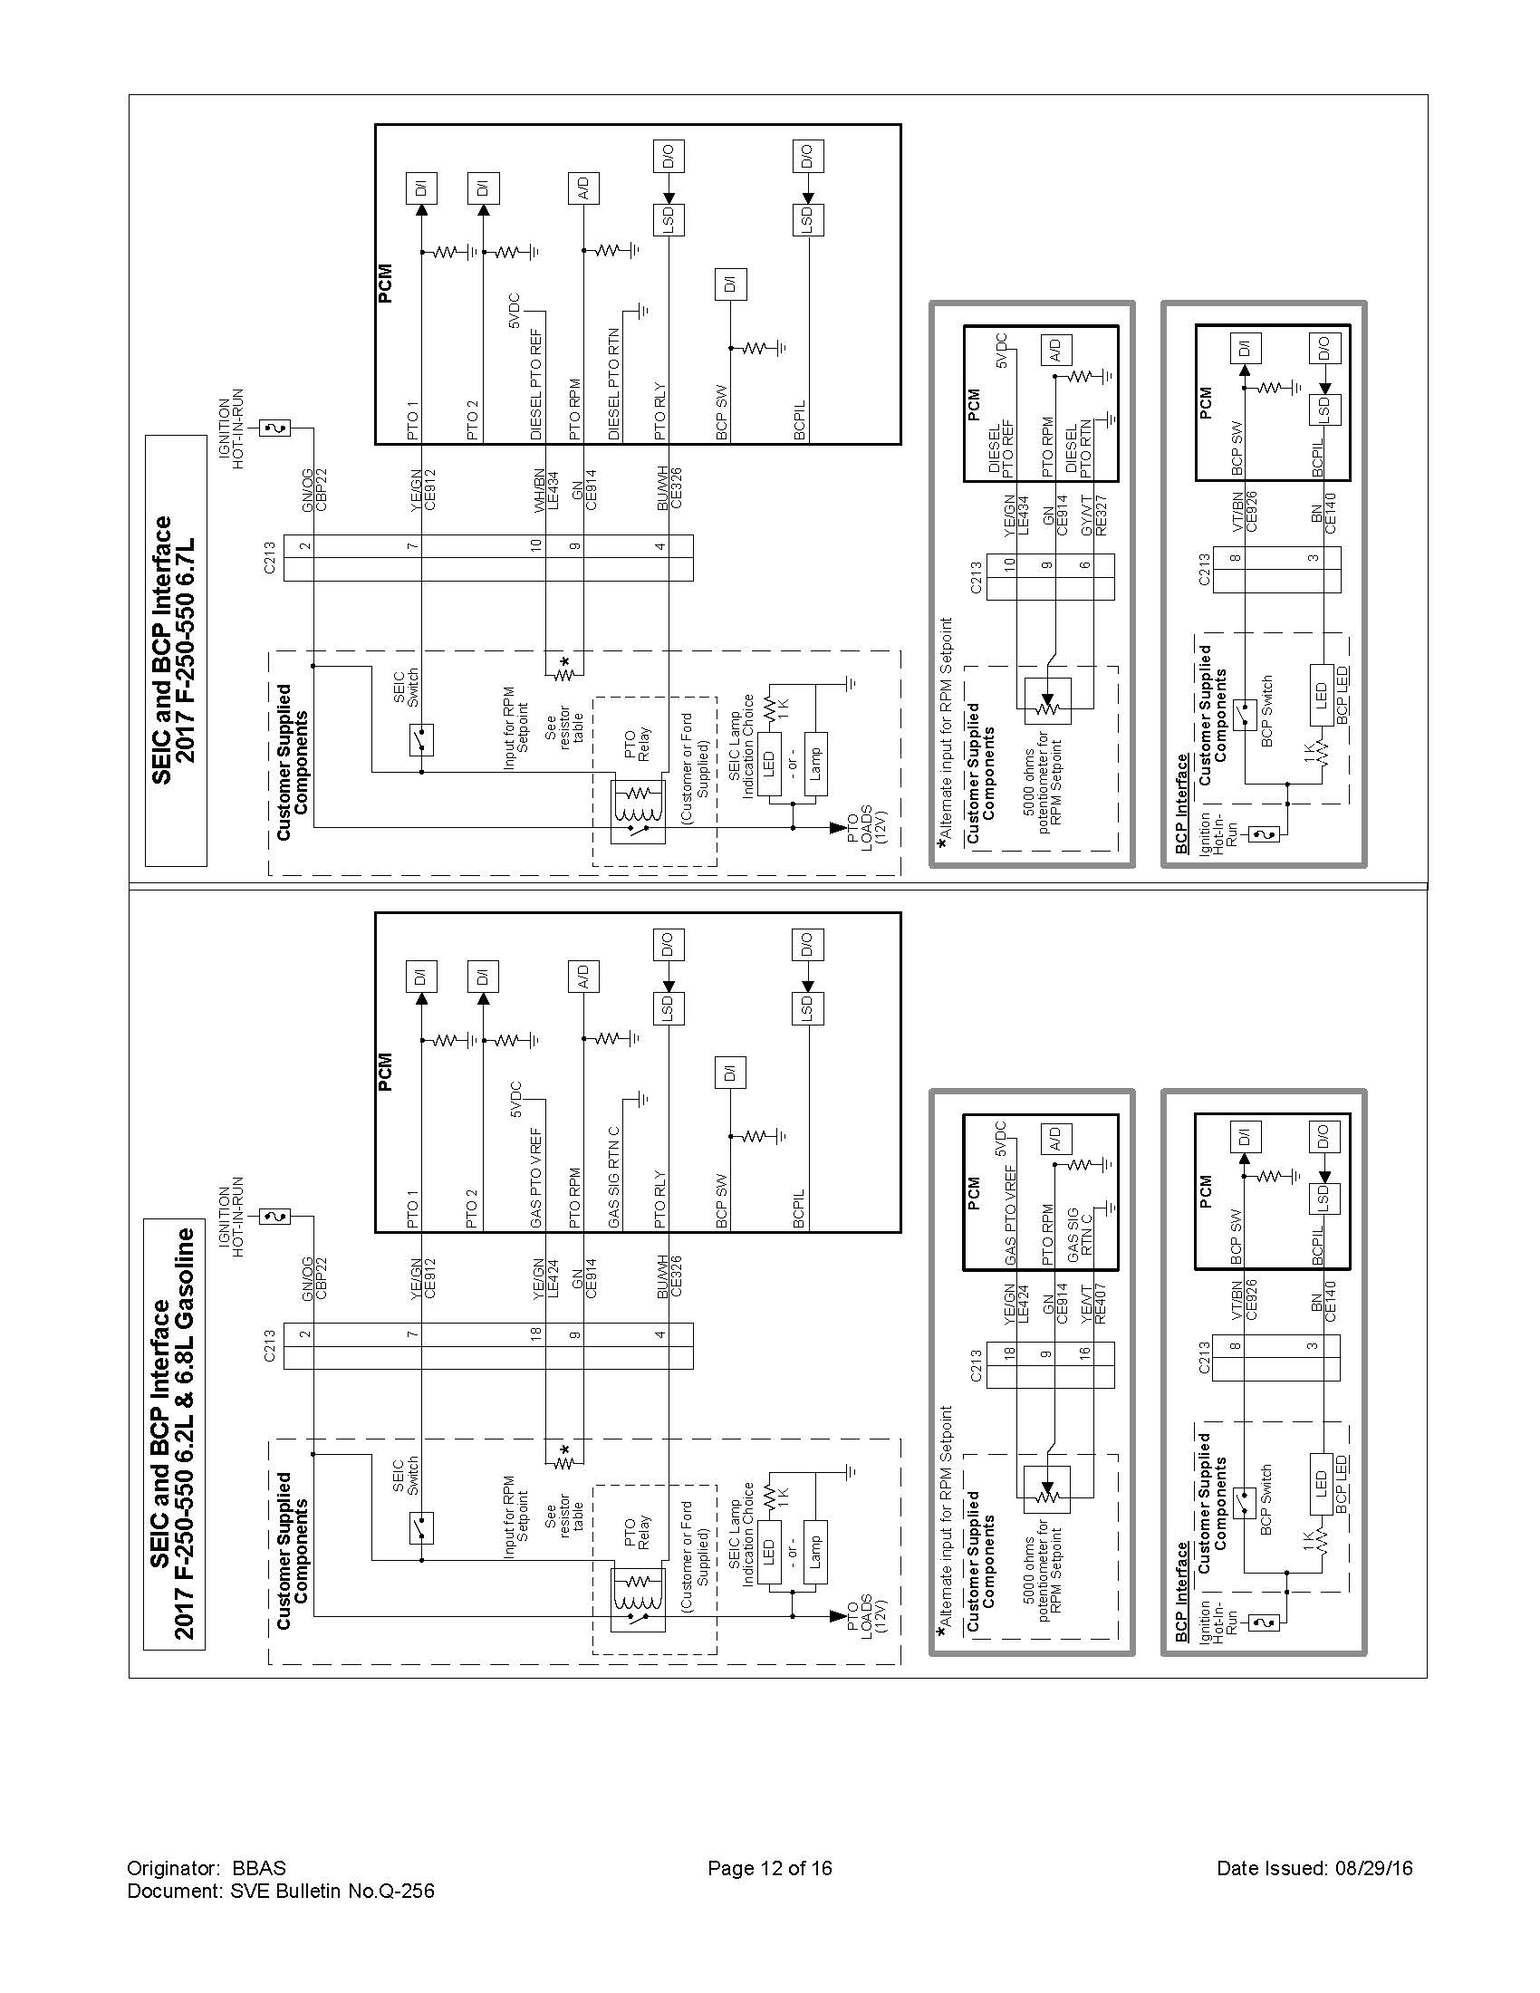 Ford 7610 Sel Wiring Diagram. Mf 165 Wiring Diagram, Mey ... Oliver Tractor Alternator Wiring Diagram on